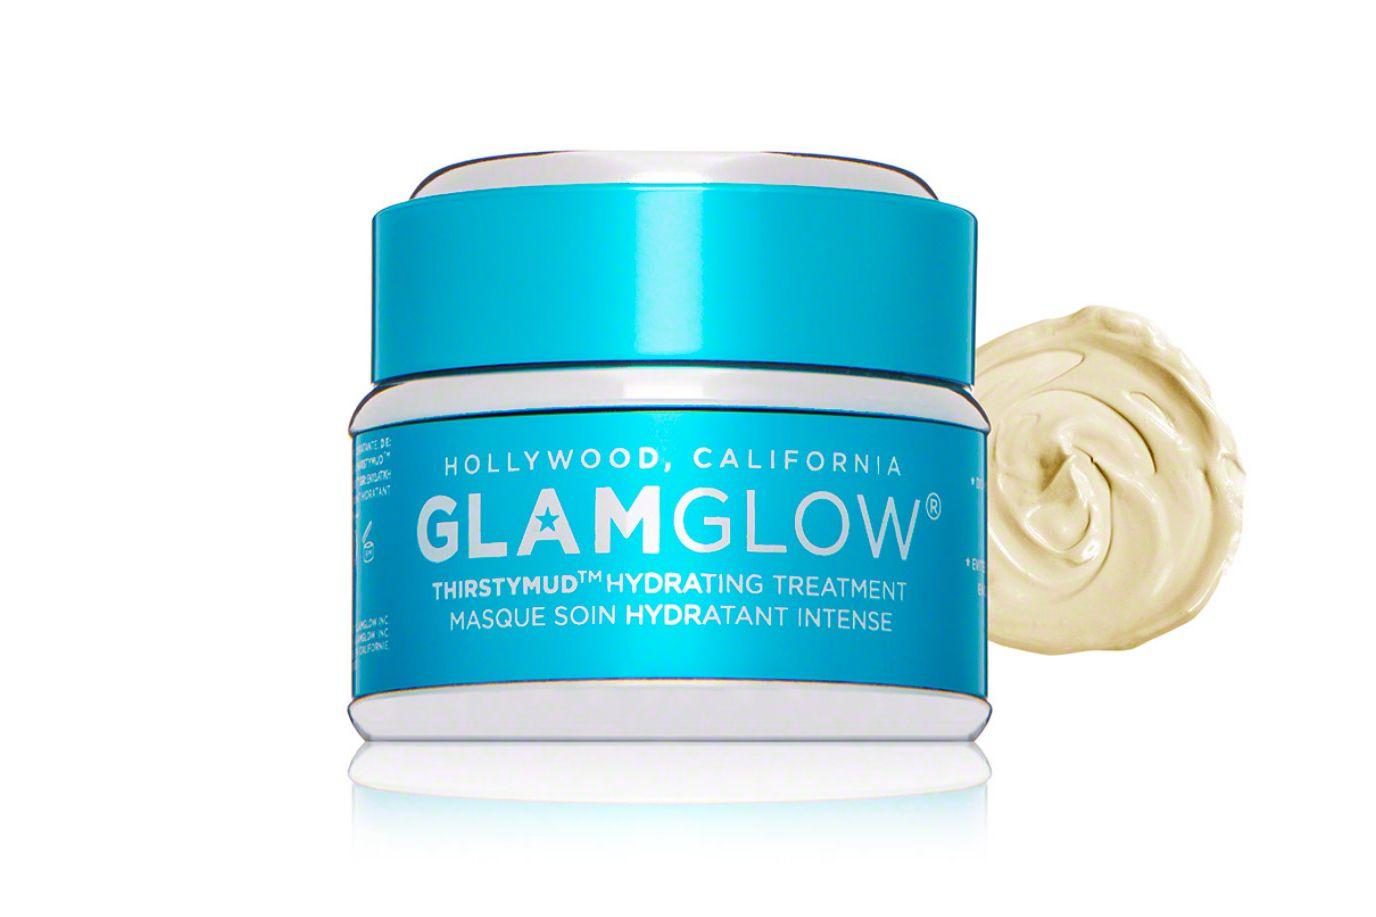 GlamGlow Thirstymud Hydrating Treatment Masque